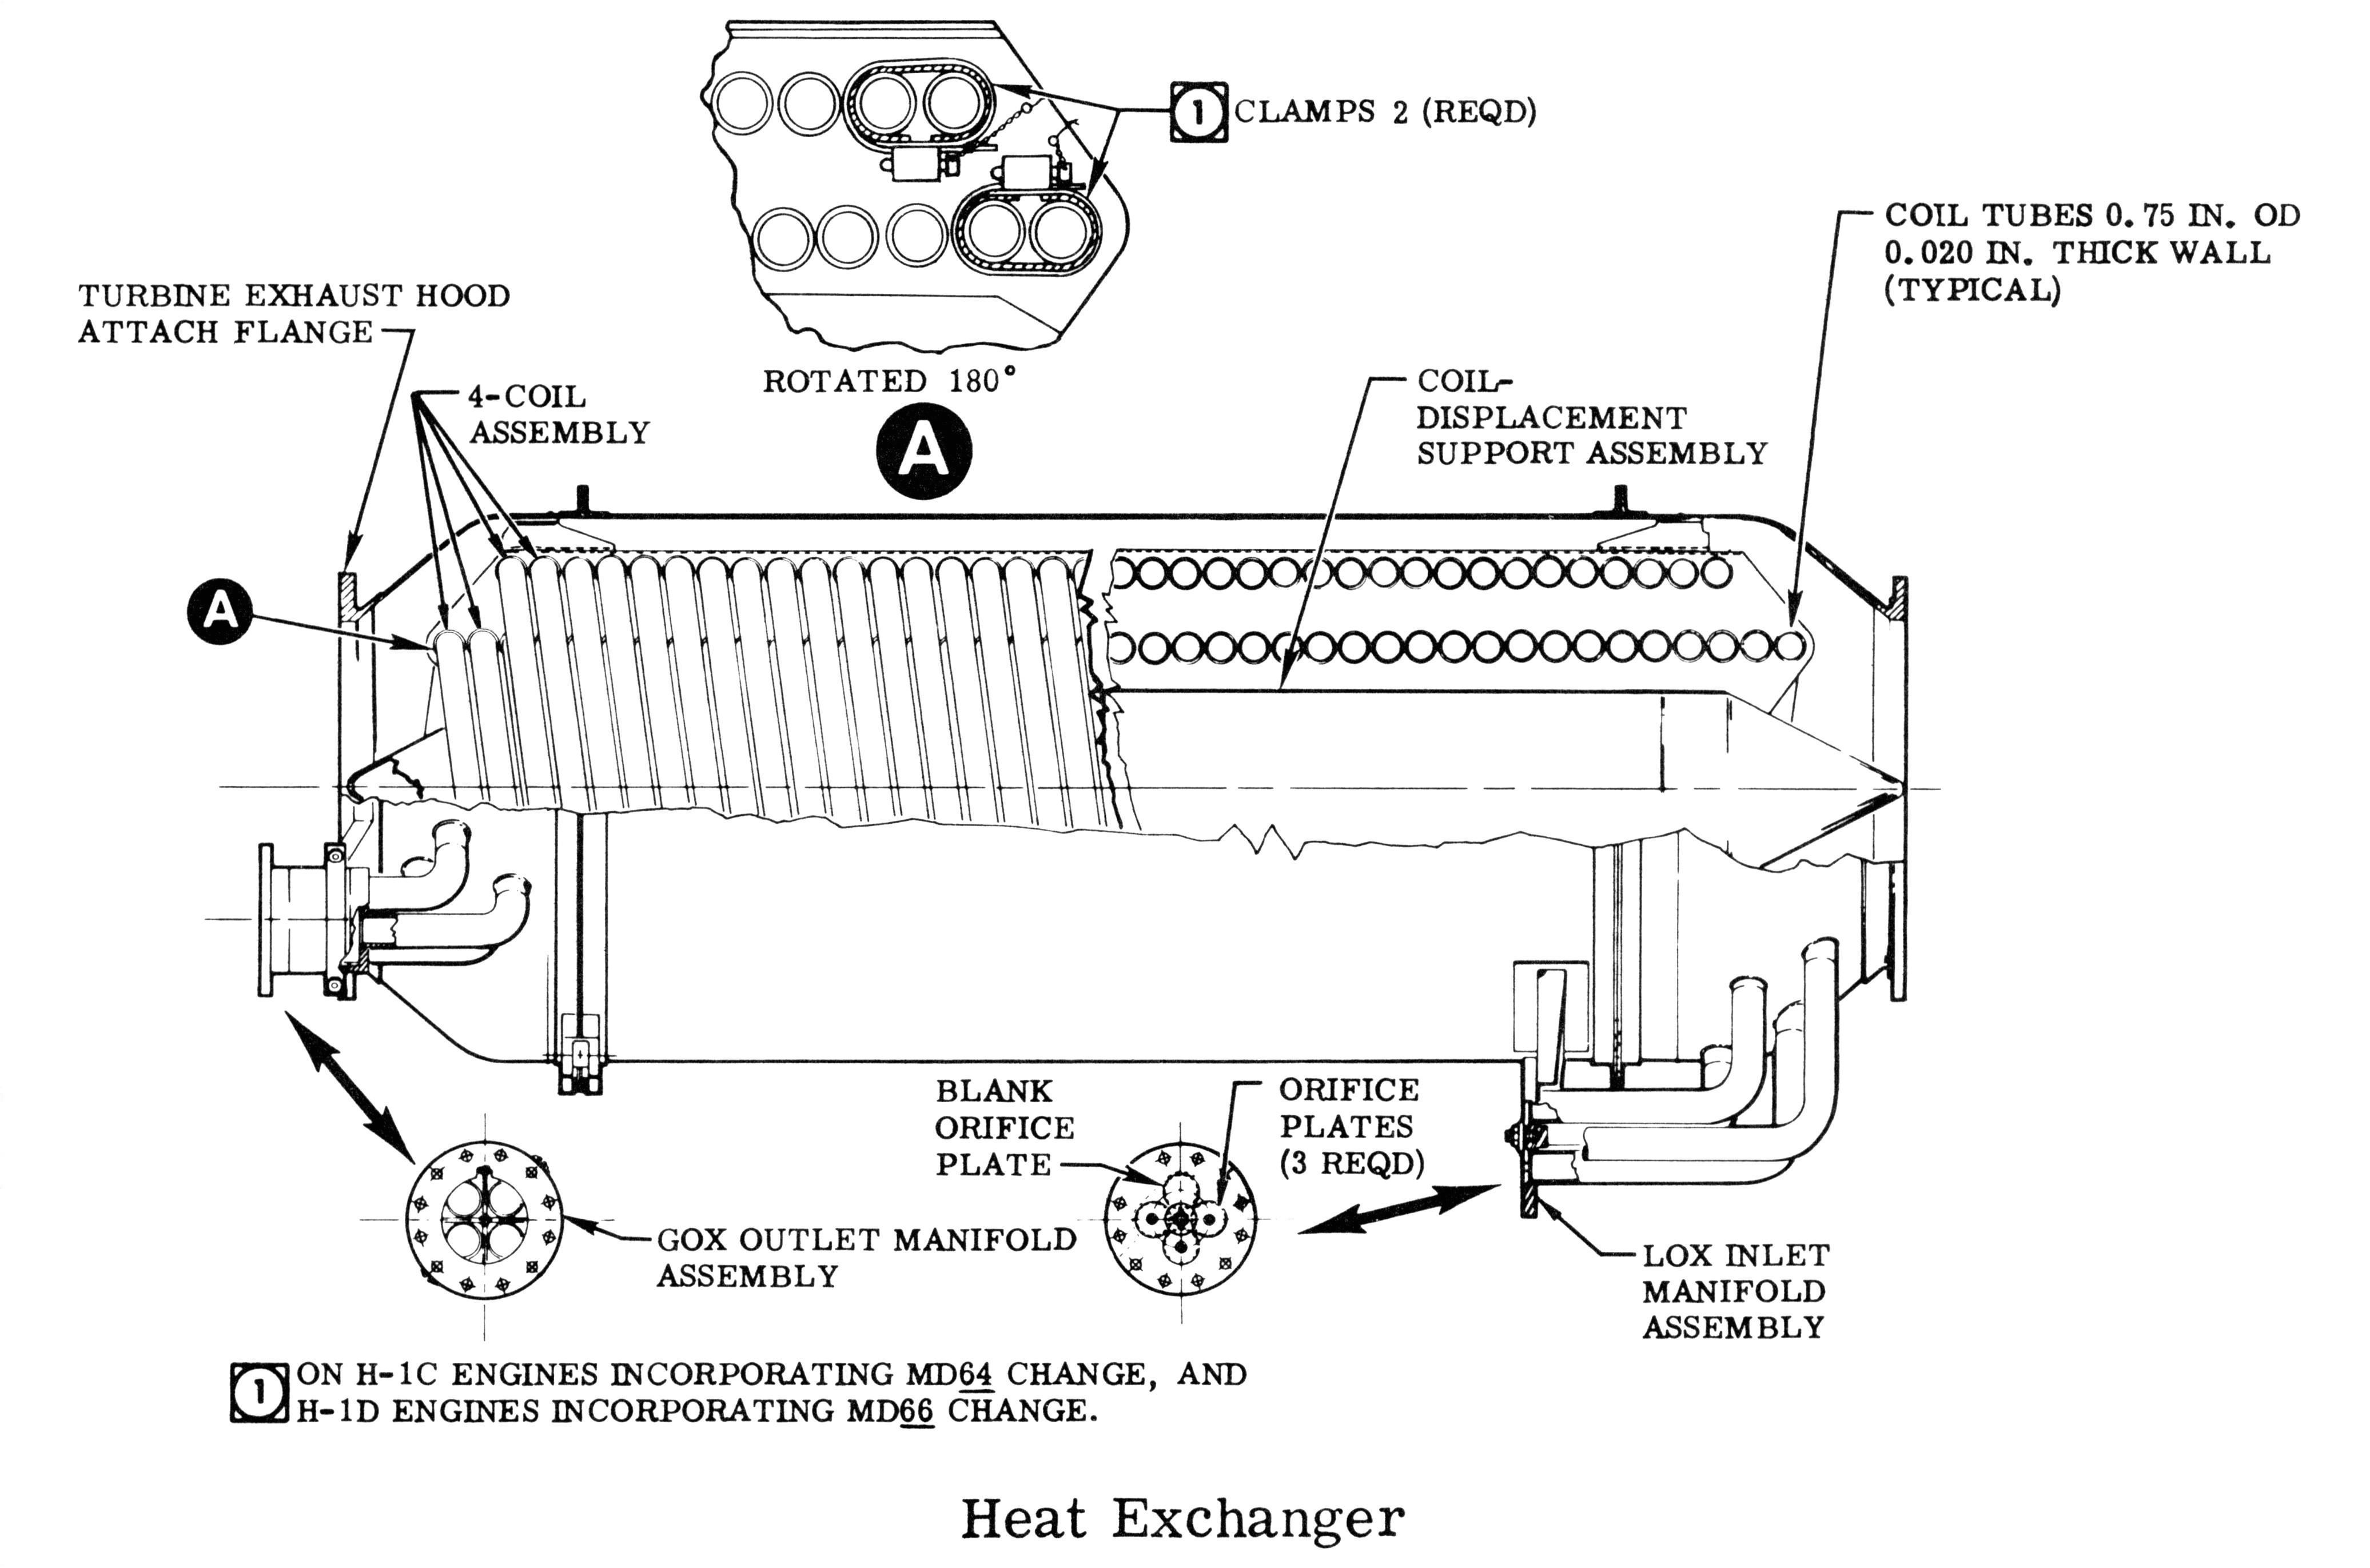 electric water heater diagram fresh wiring diagram for electric immersion heater fresh awesome electric